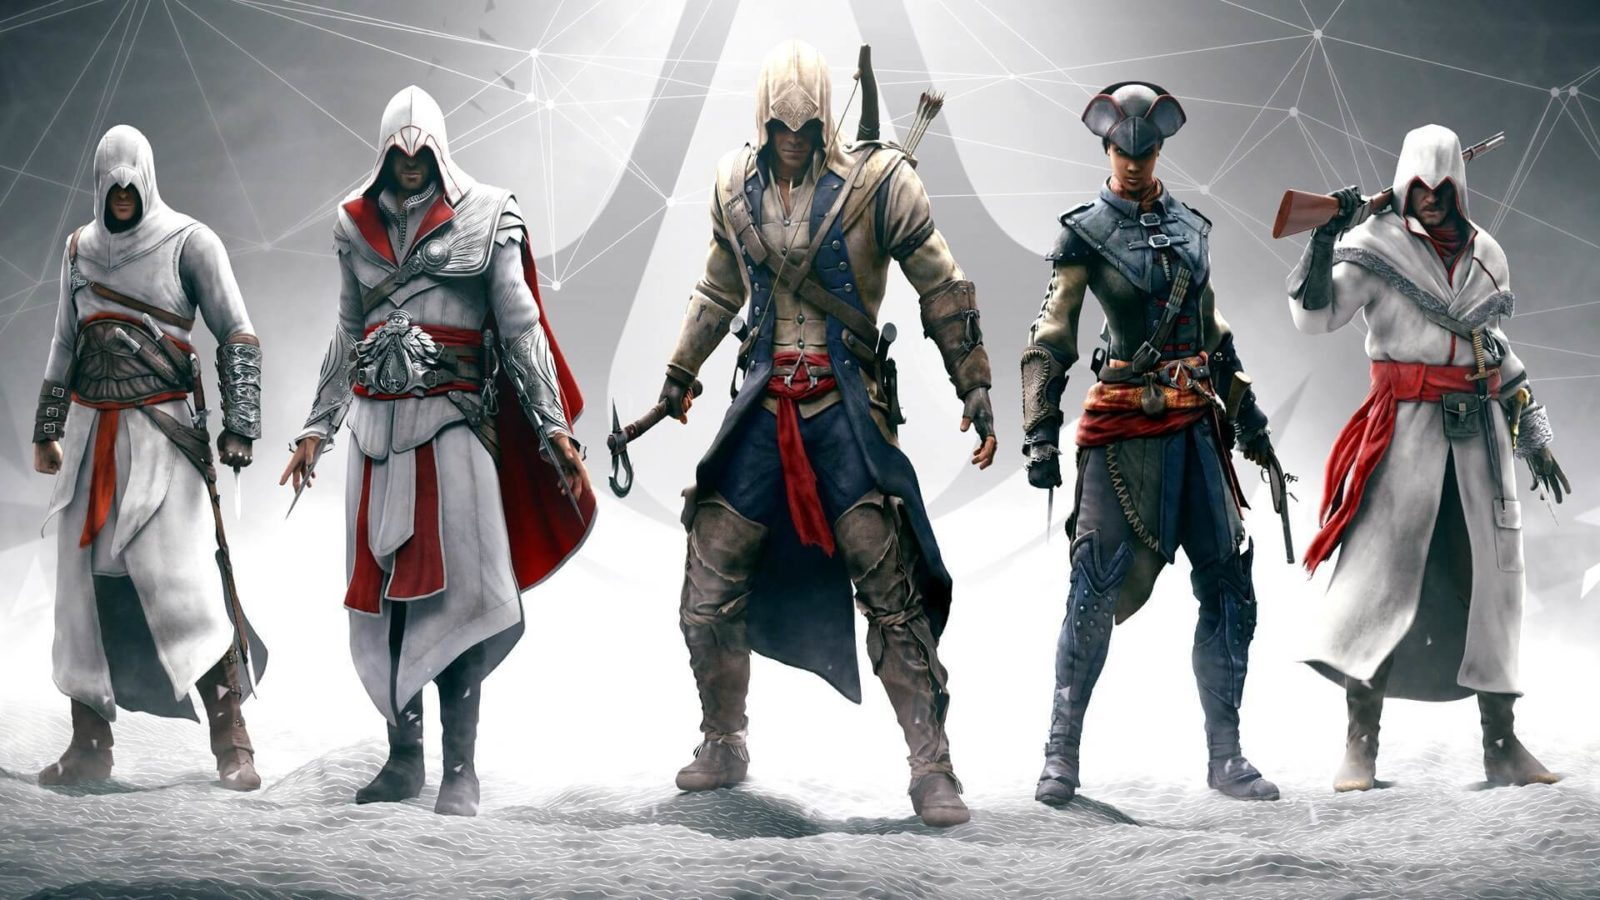 Assassin's Creed Unity Türkçe Yama çıktı!